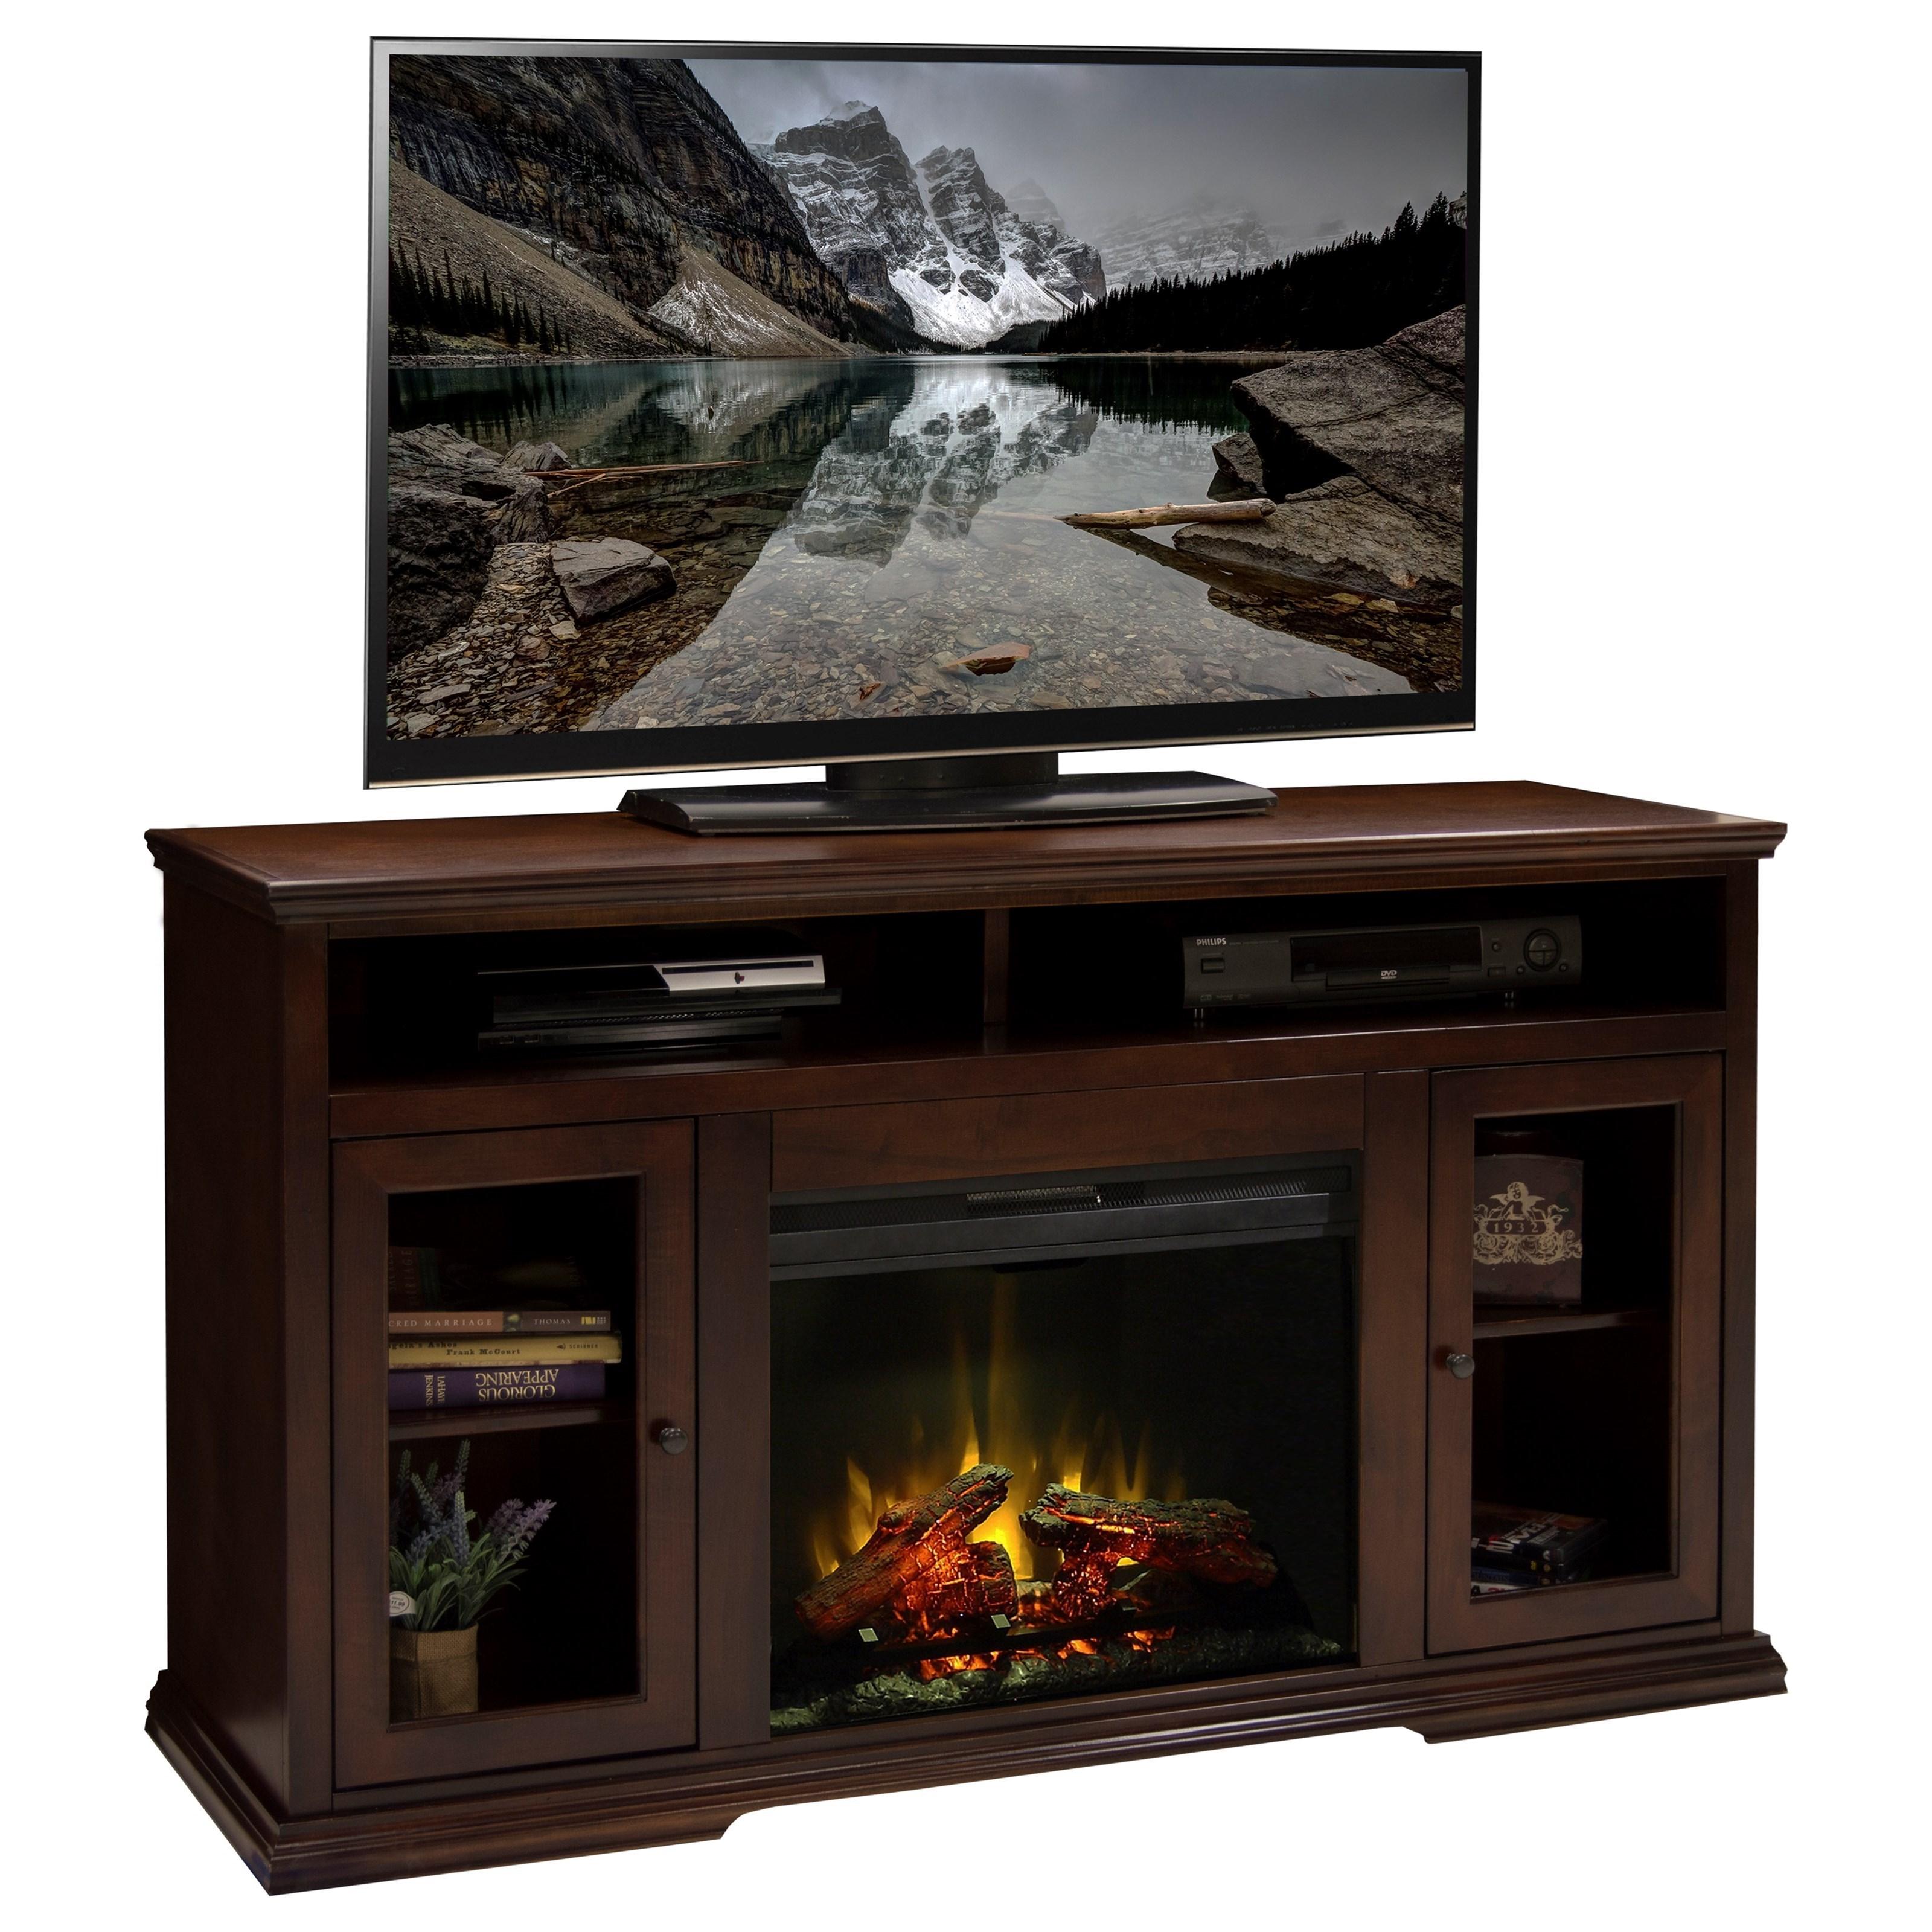 Legends Furniture Ashton Place Fireplace Console - Item Number: AP5304KIT